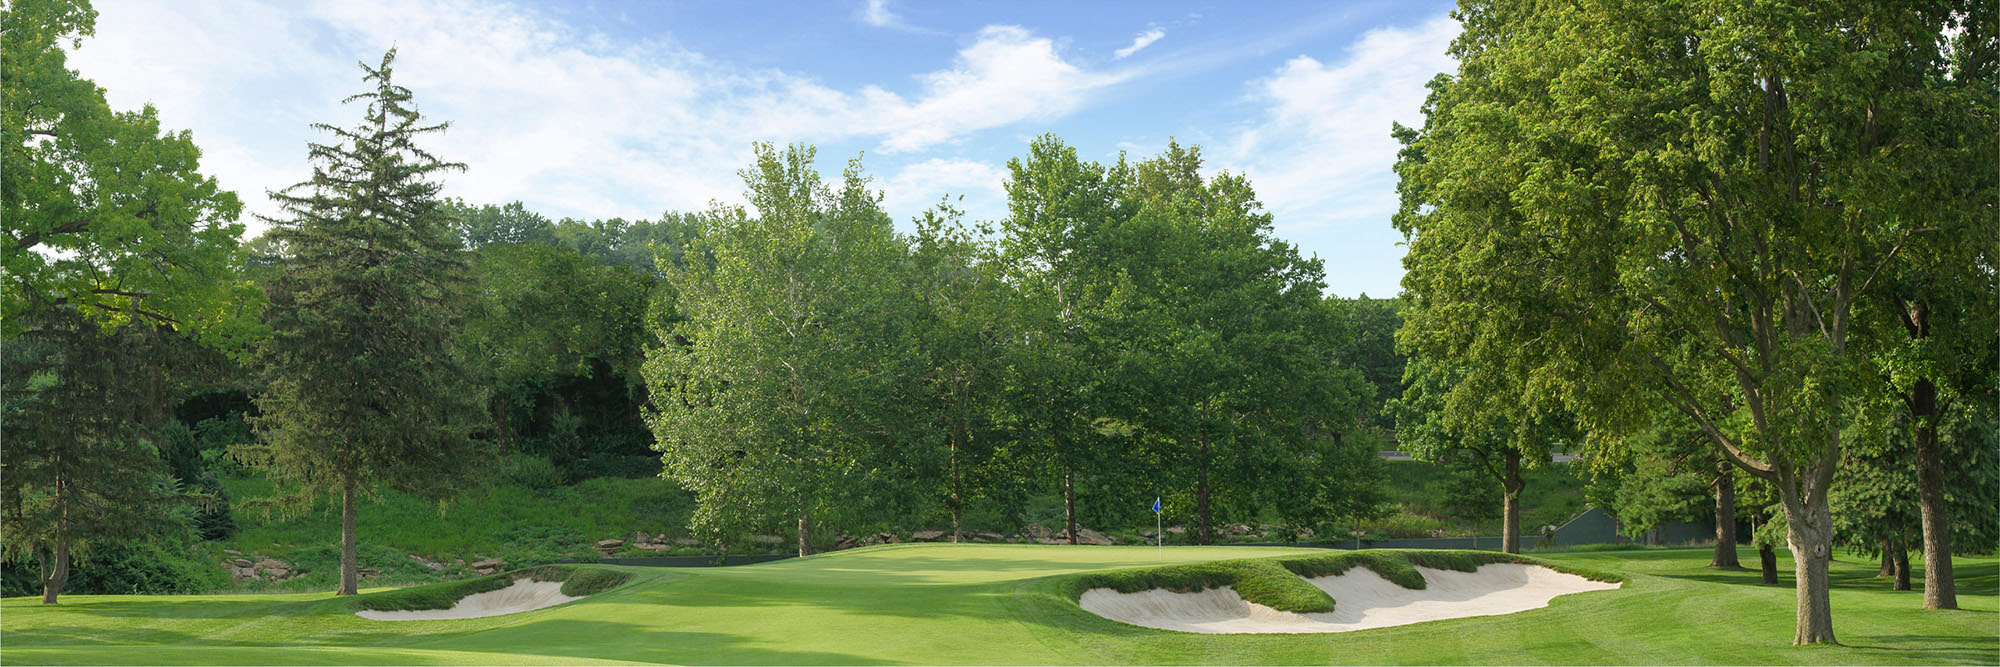 Golf Course Image - Mission Hills No. 7